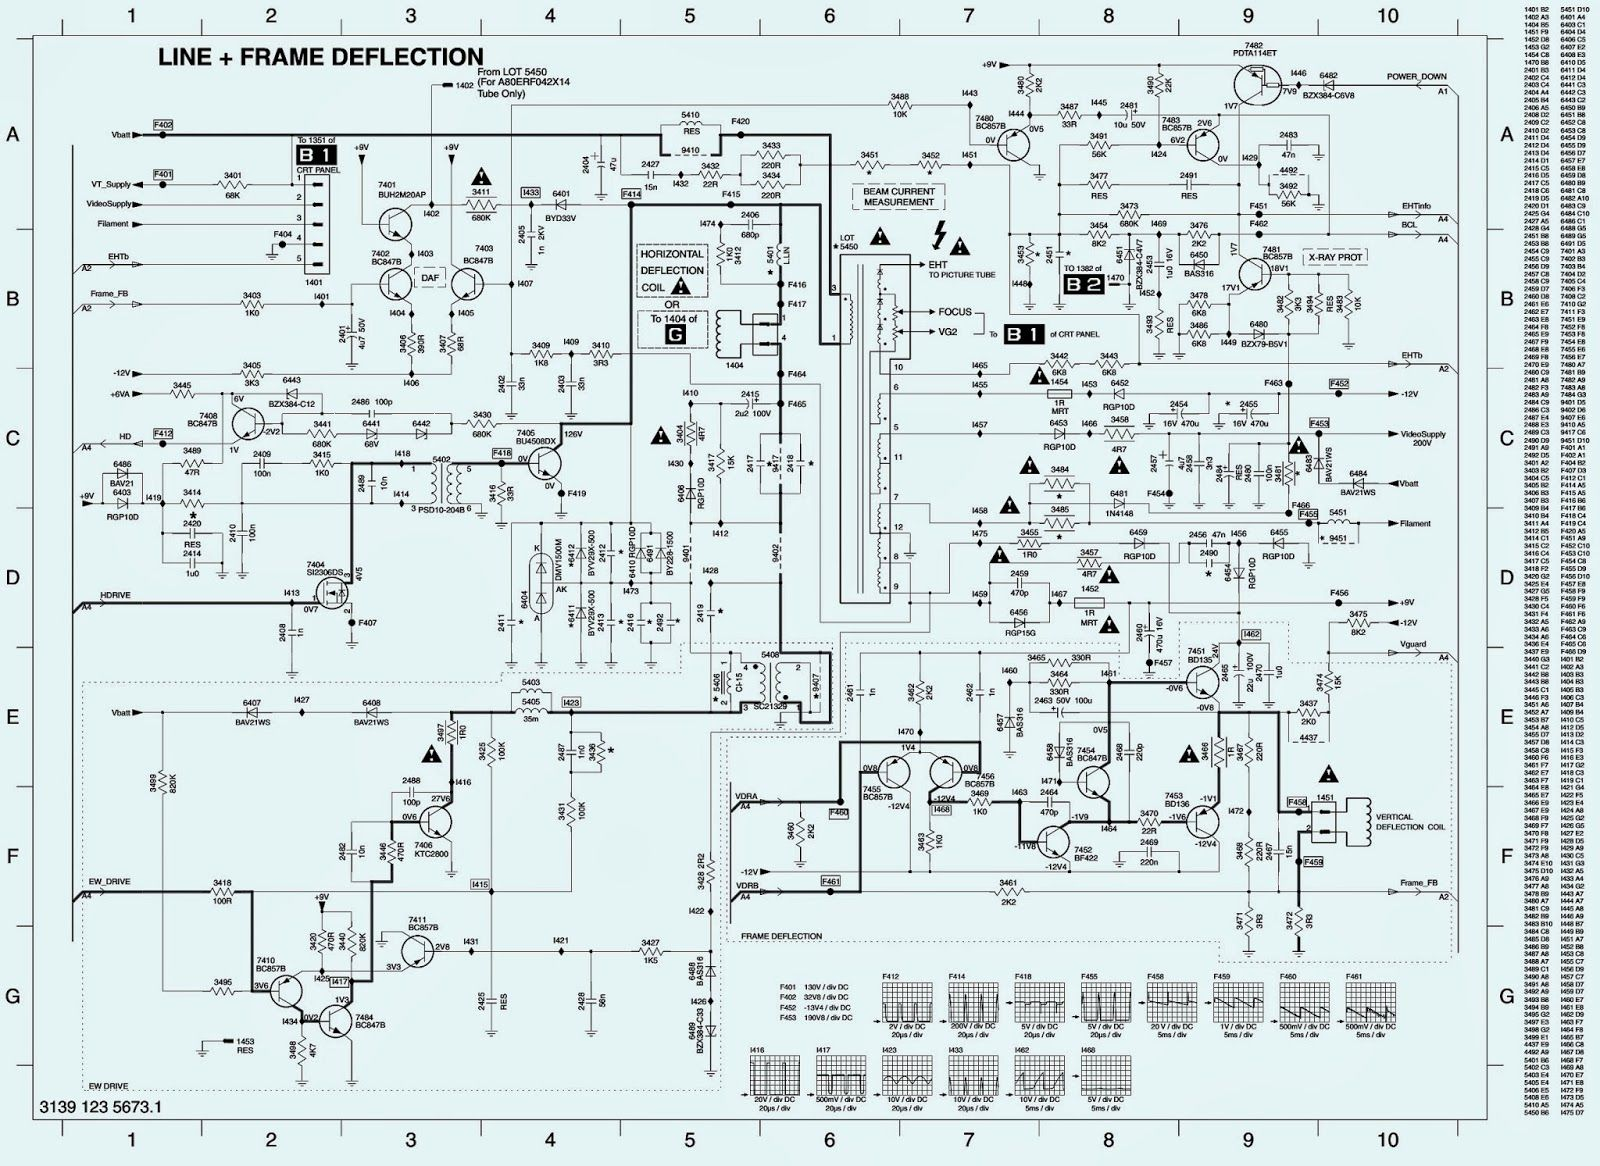 [FPWZ_2684]  Sansui Tv Circuit Diagram Free Download - Circuit Diagram Images | Circuit  diagram, Circuit, Circuit board design | T V Circuit Diagram Free Download |  | Pinterest